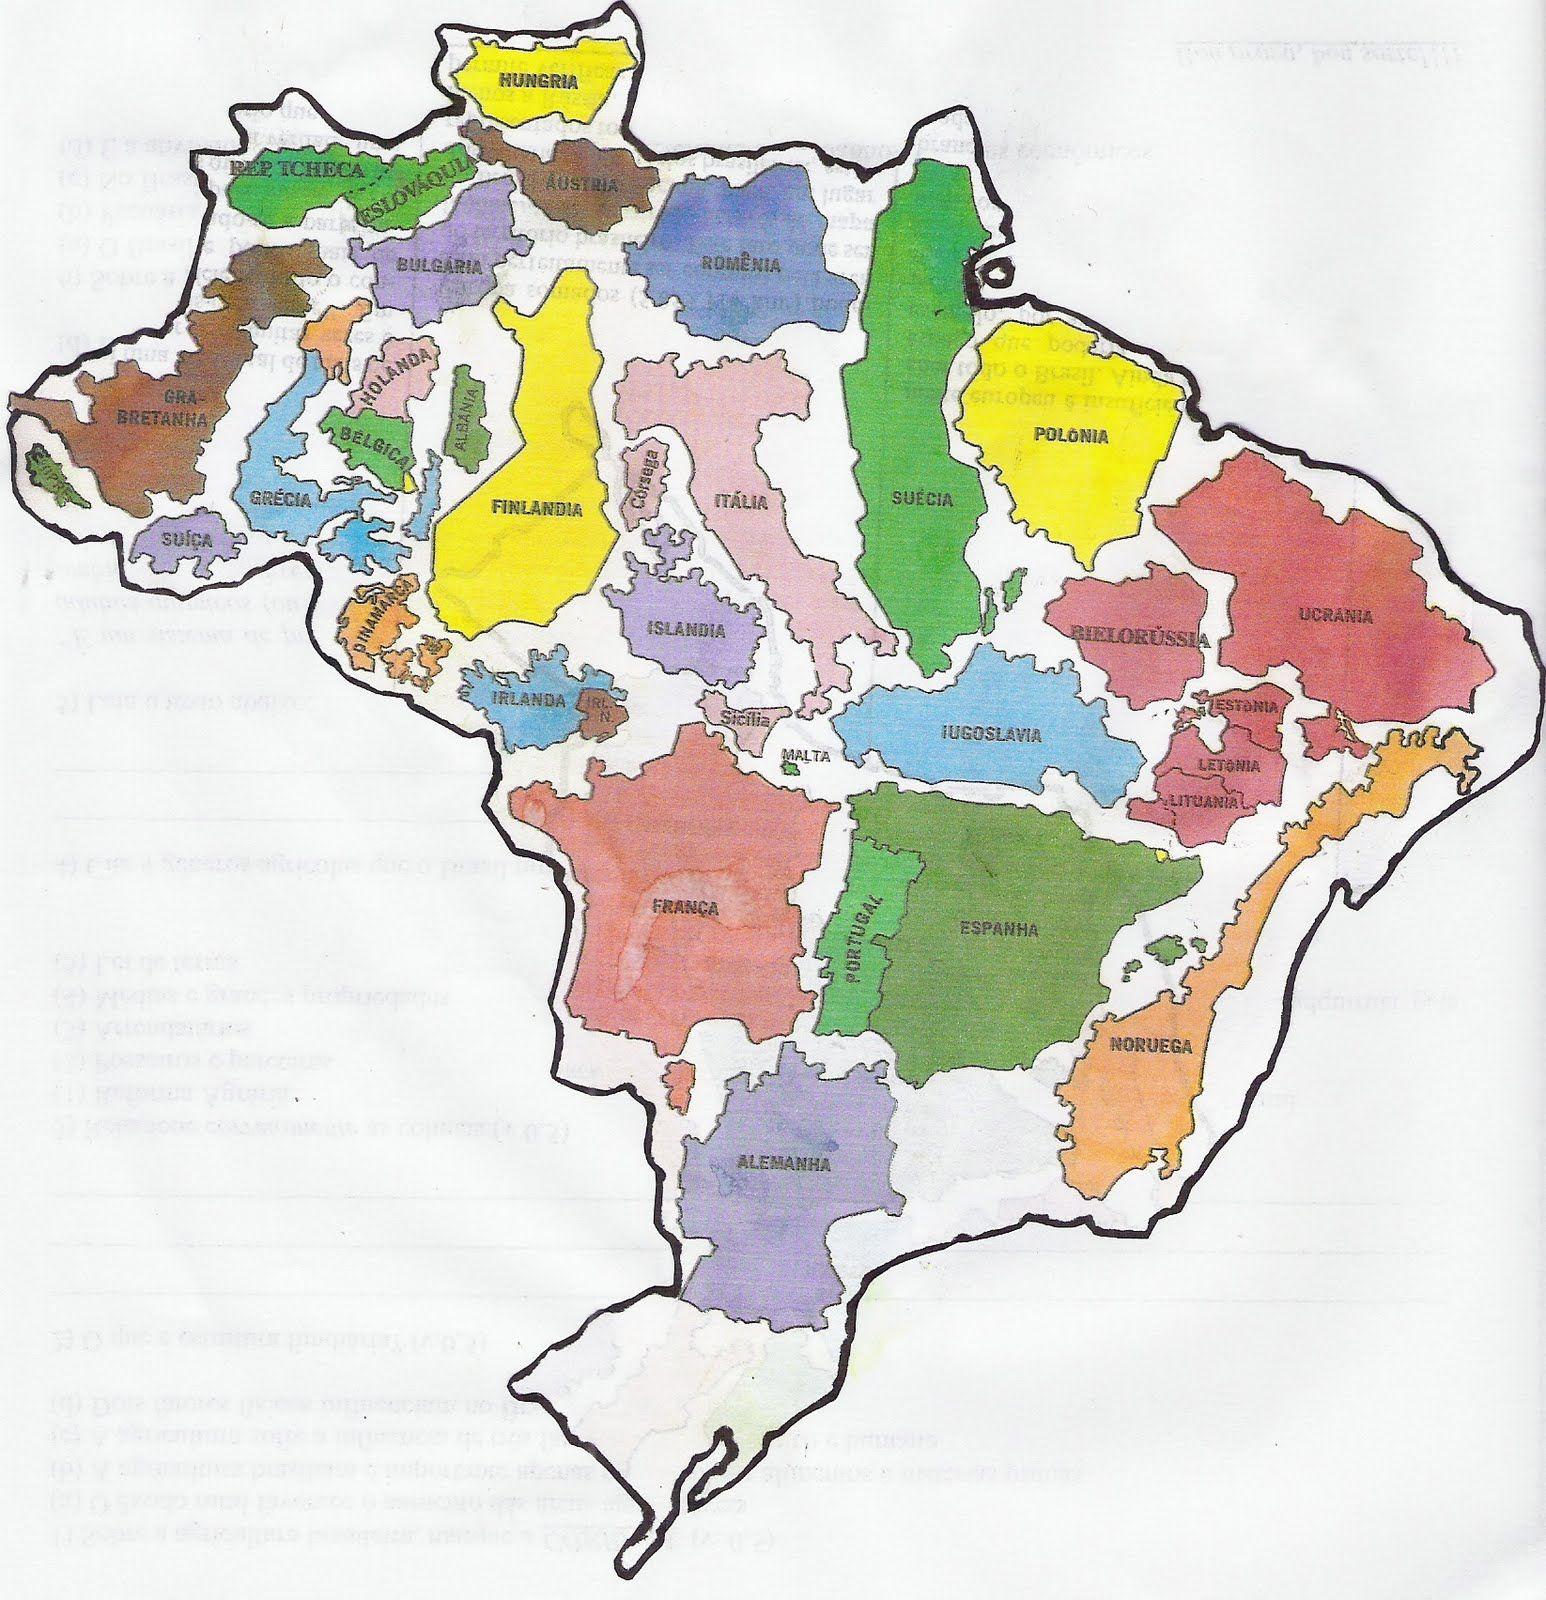 A Europa Cabe No Brasil Mapa Brasil Cartografia Mapas